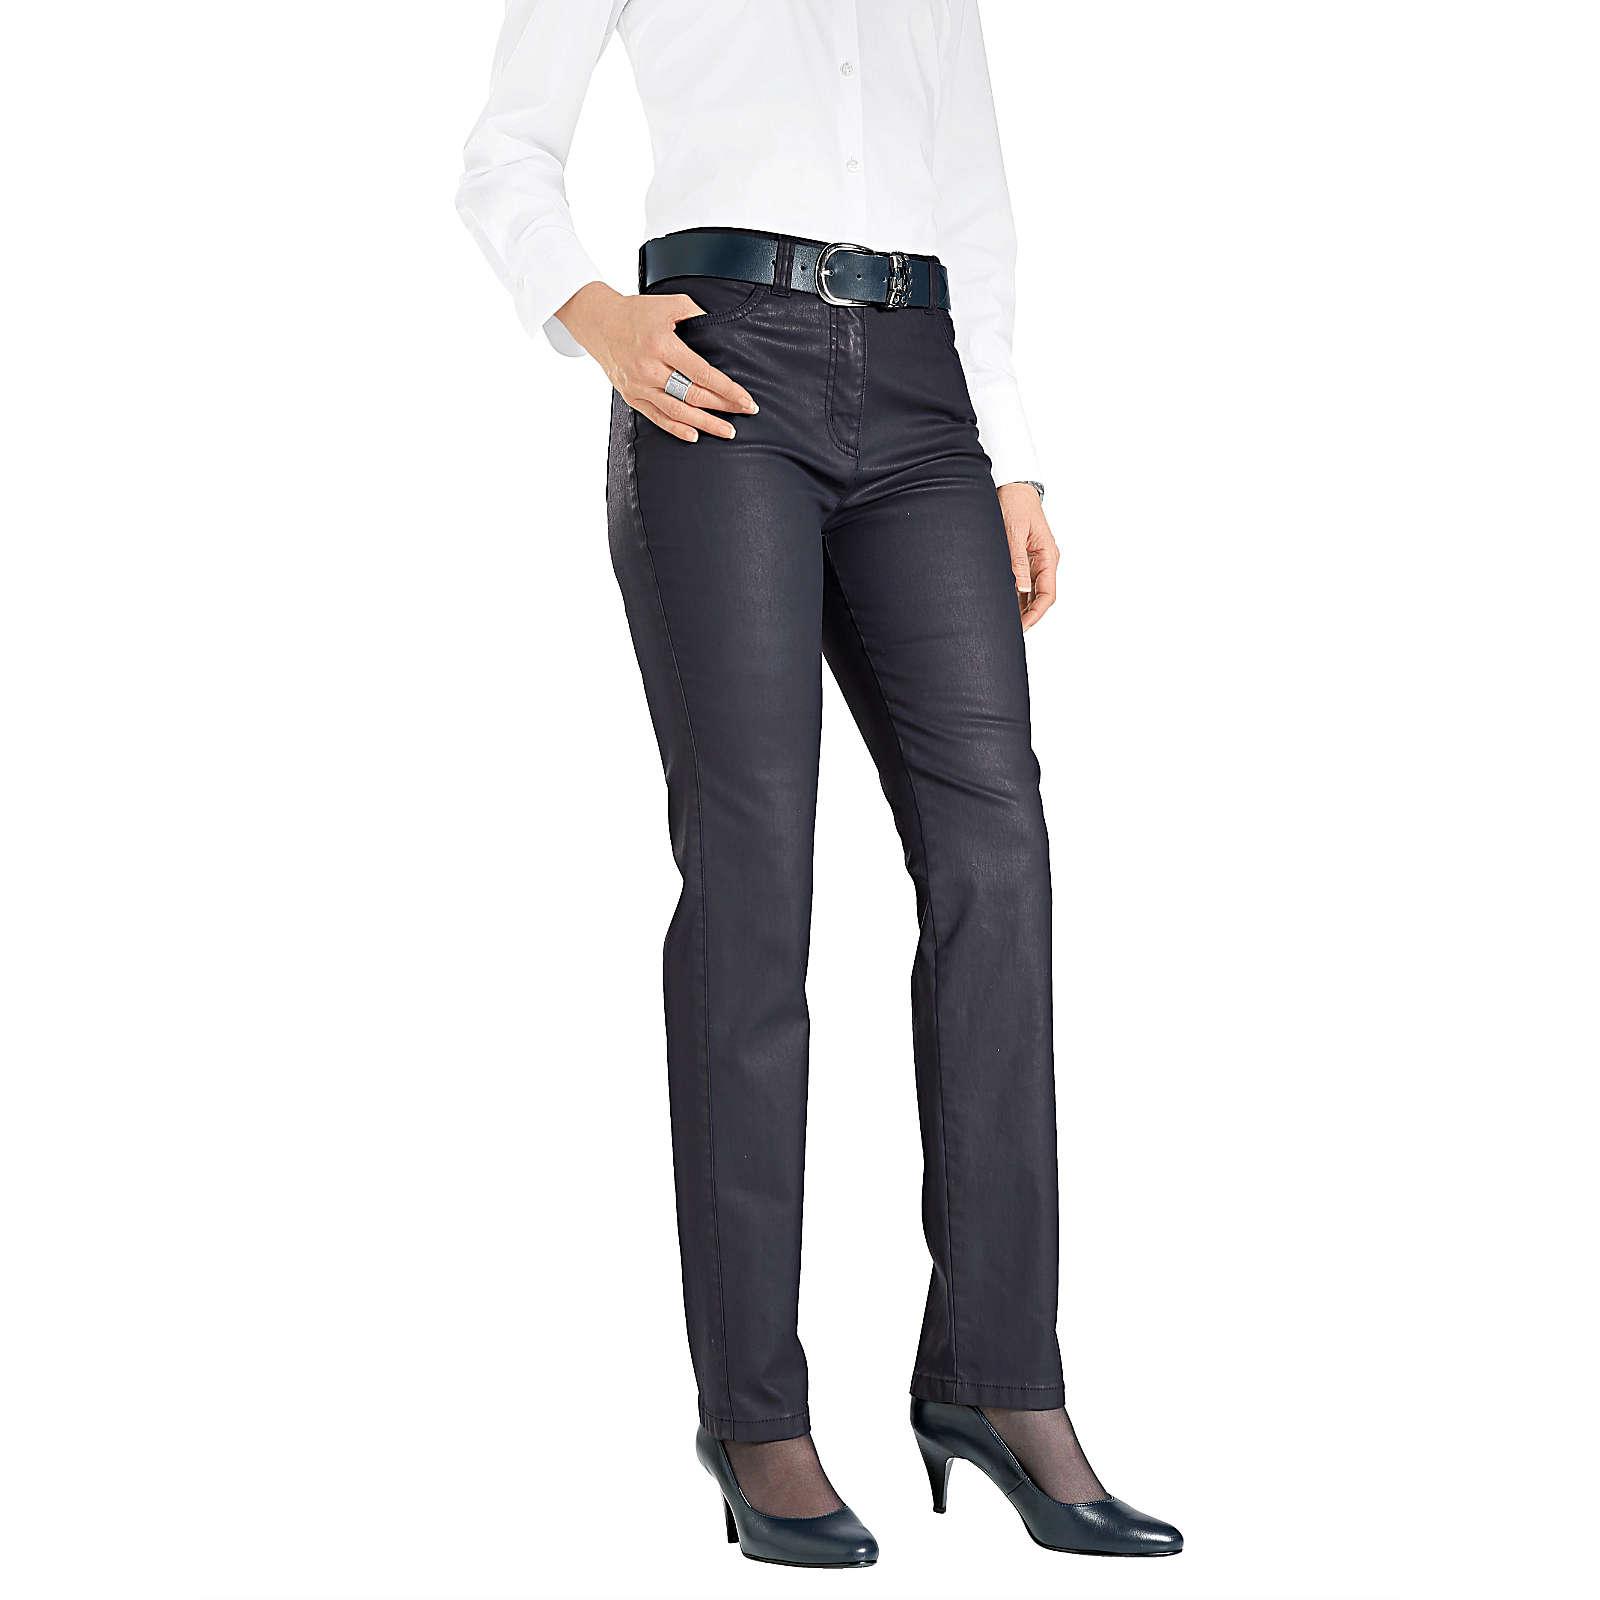 TONI 5-Pocket-Hose dunkelblau Damen Gr. 44